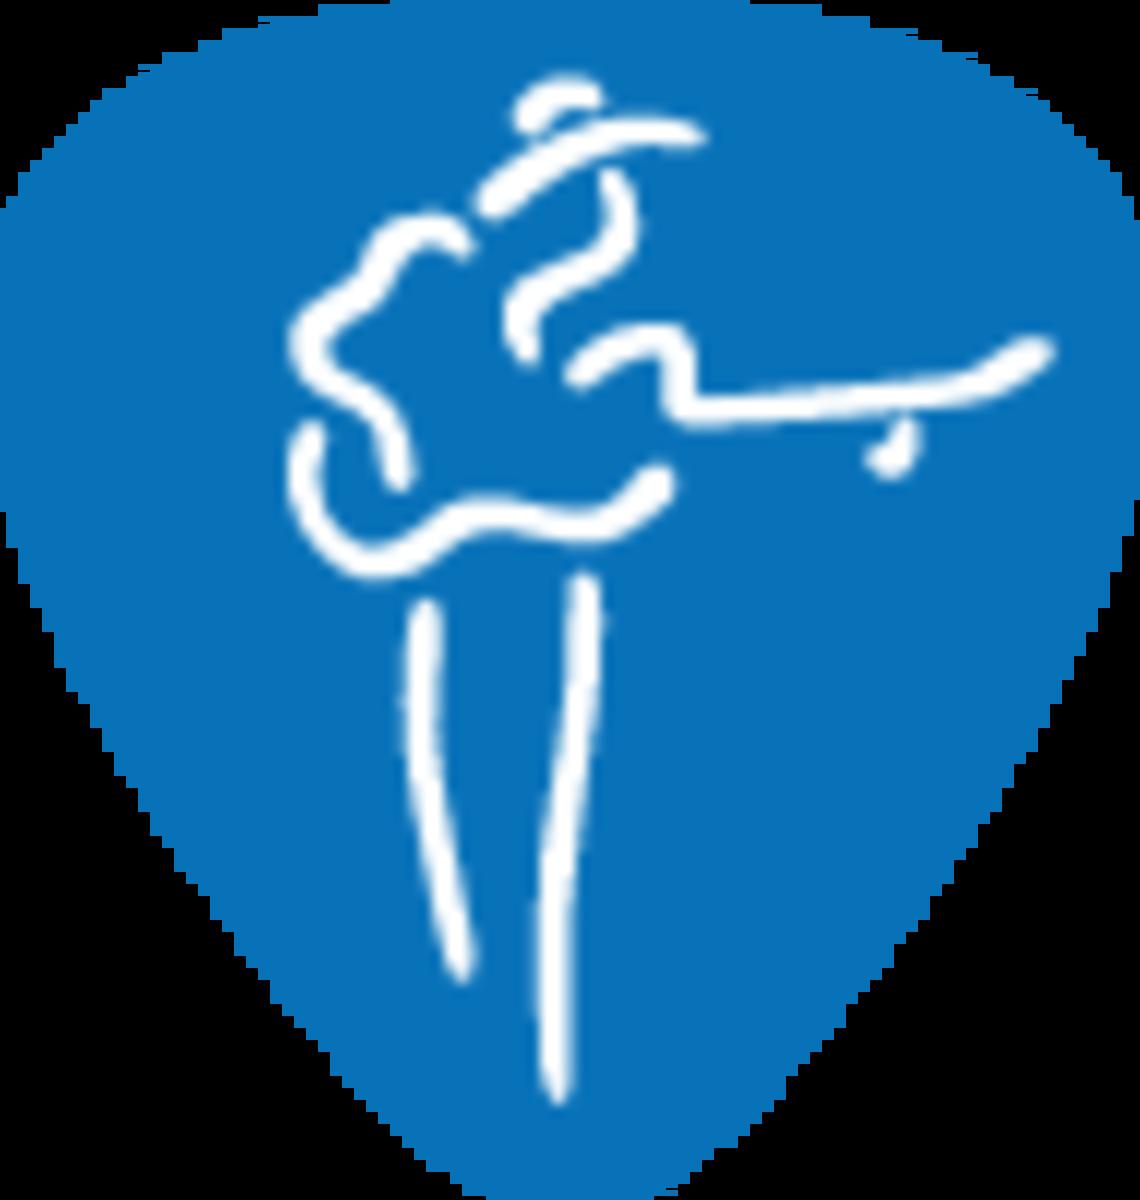 picman_logo